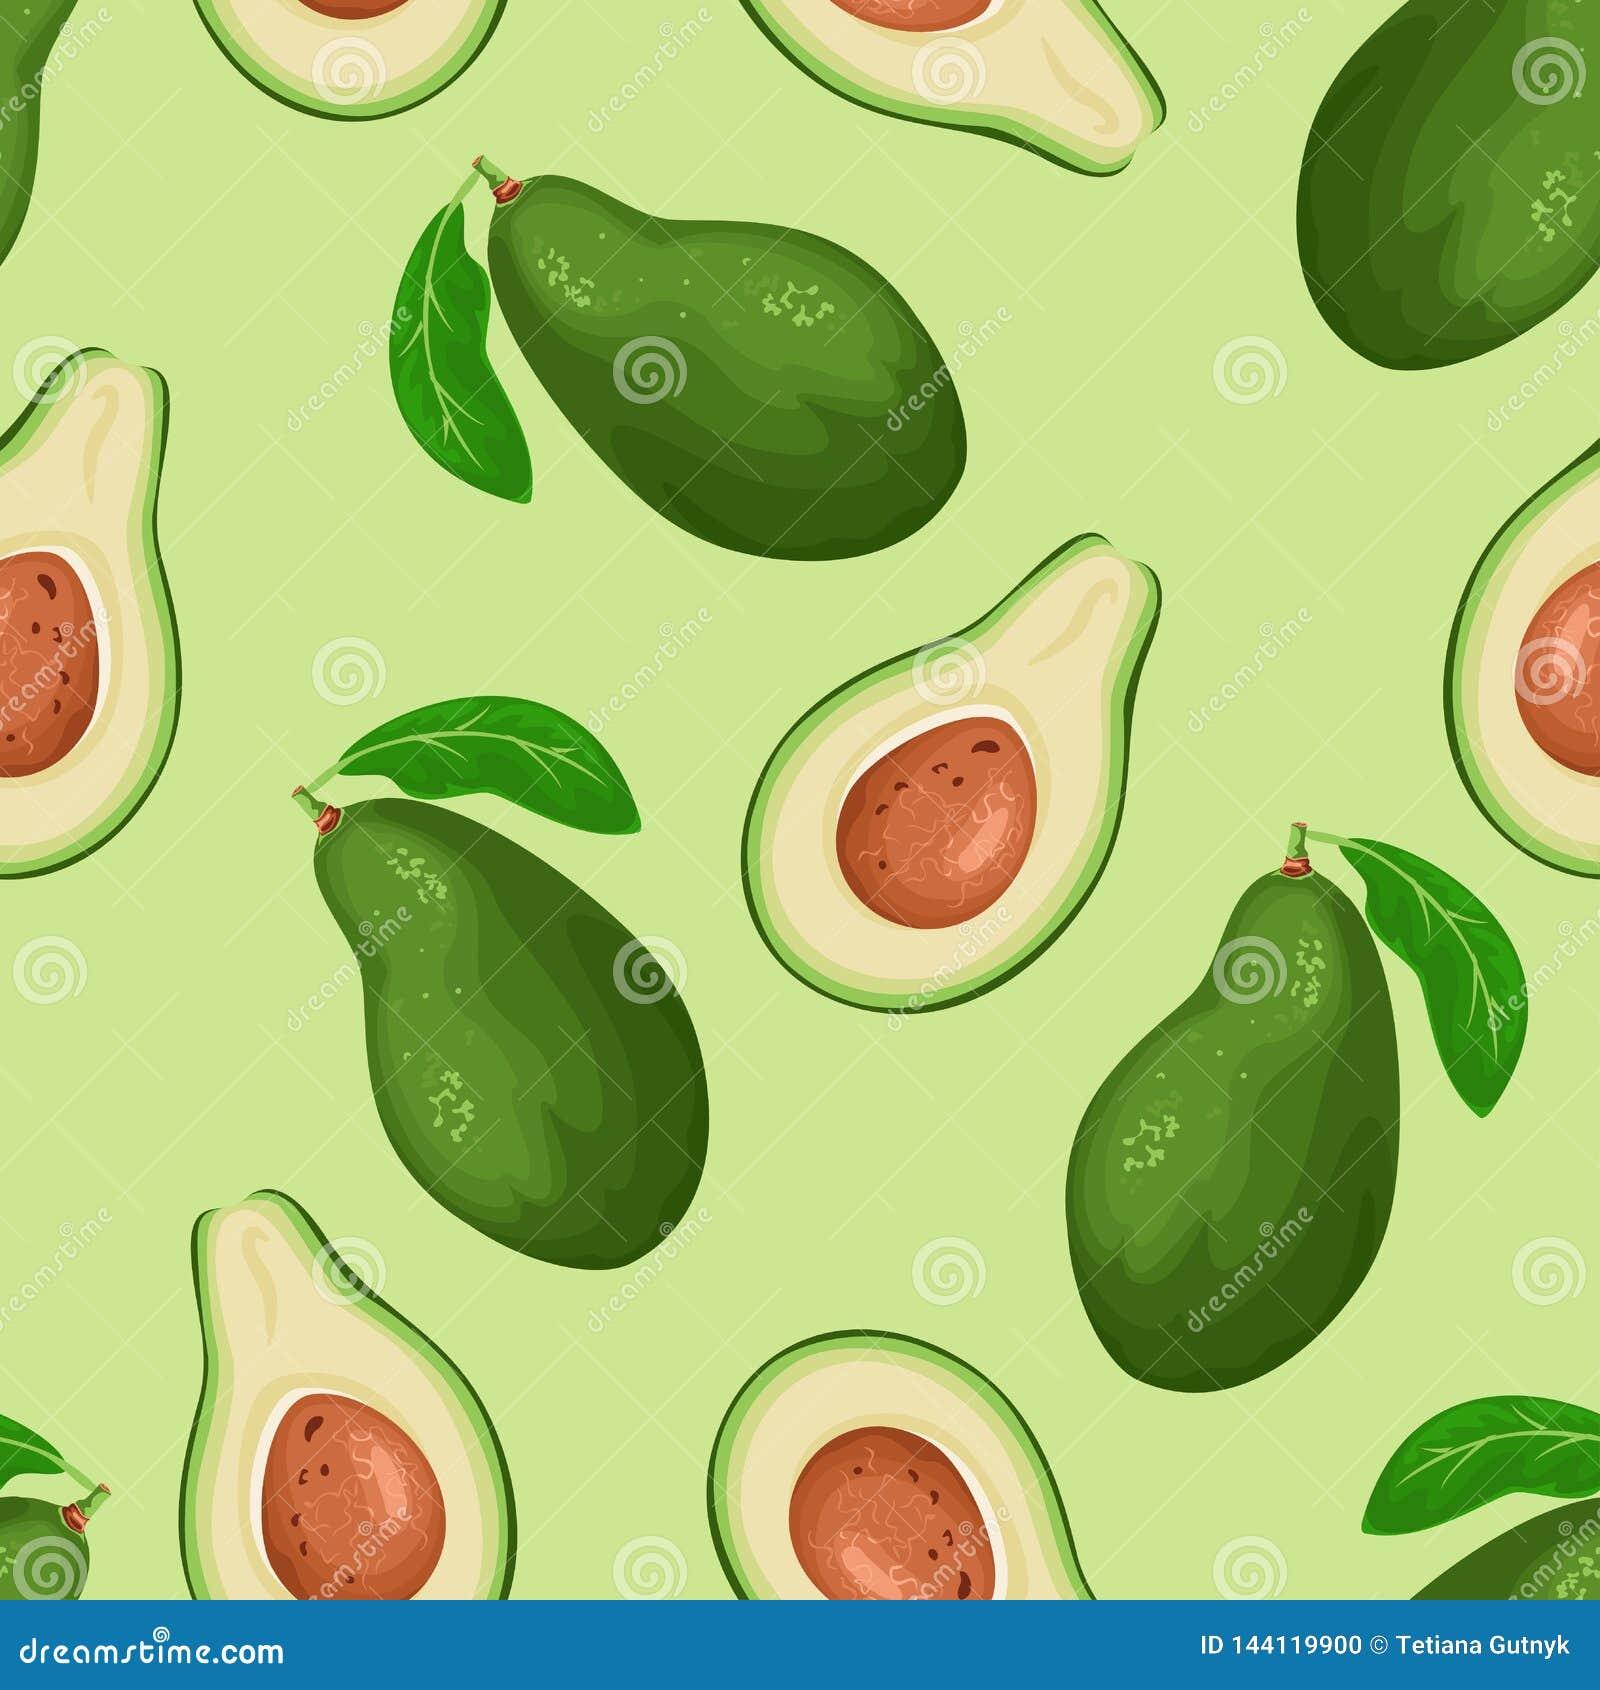 Avocado seamless pattern on green background. Cartoon simple flat style.